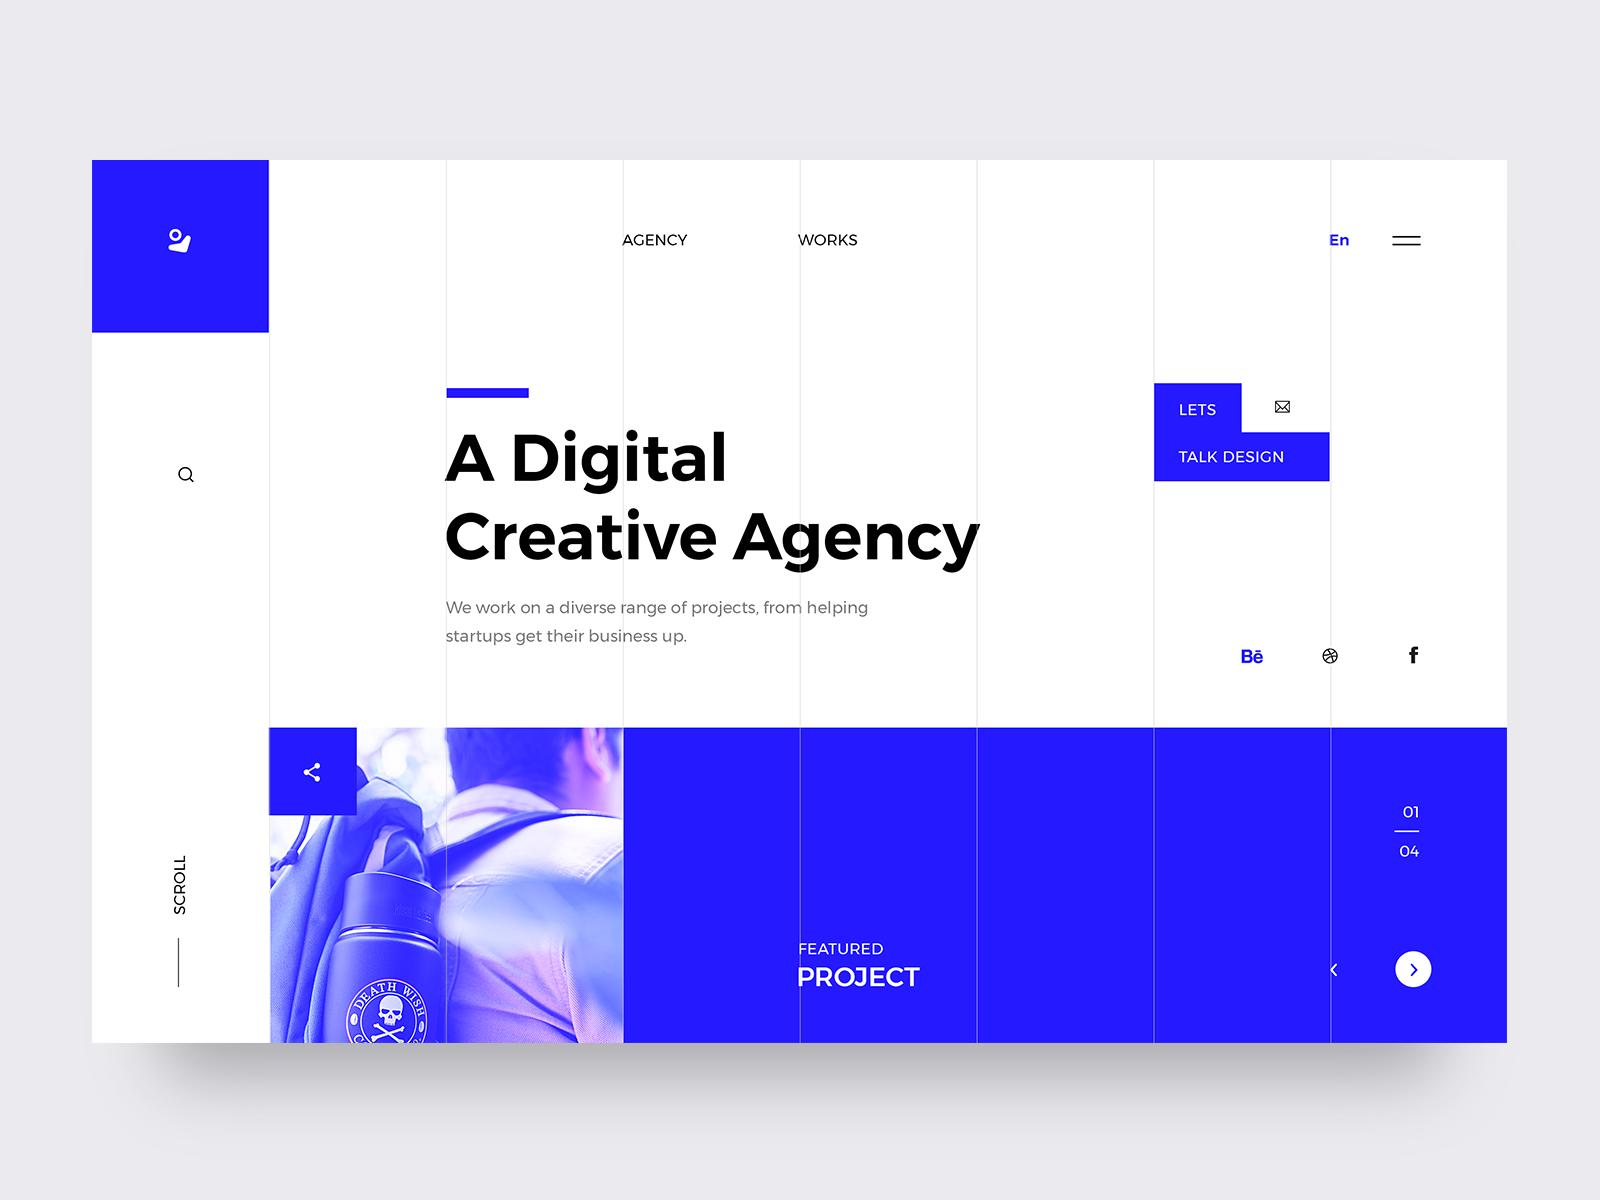 Creative Agency - Landing Page trendy modern clean graphicdesign app design agency creative agency webpage layout interface webdesign branding typography concept landing website ux ui